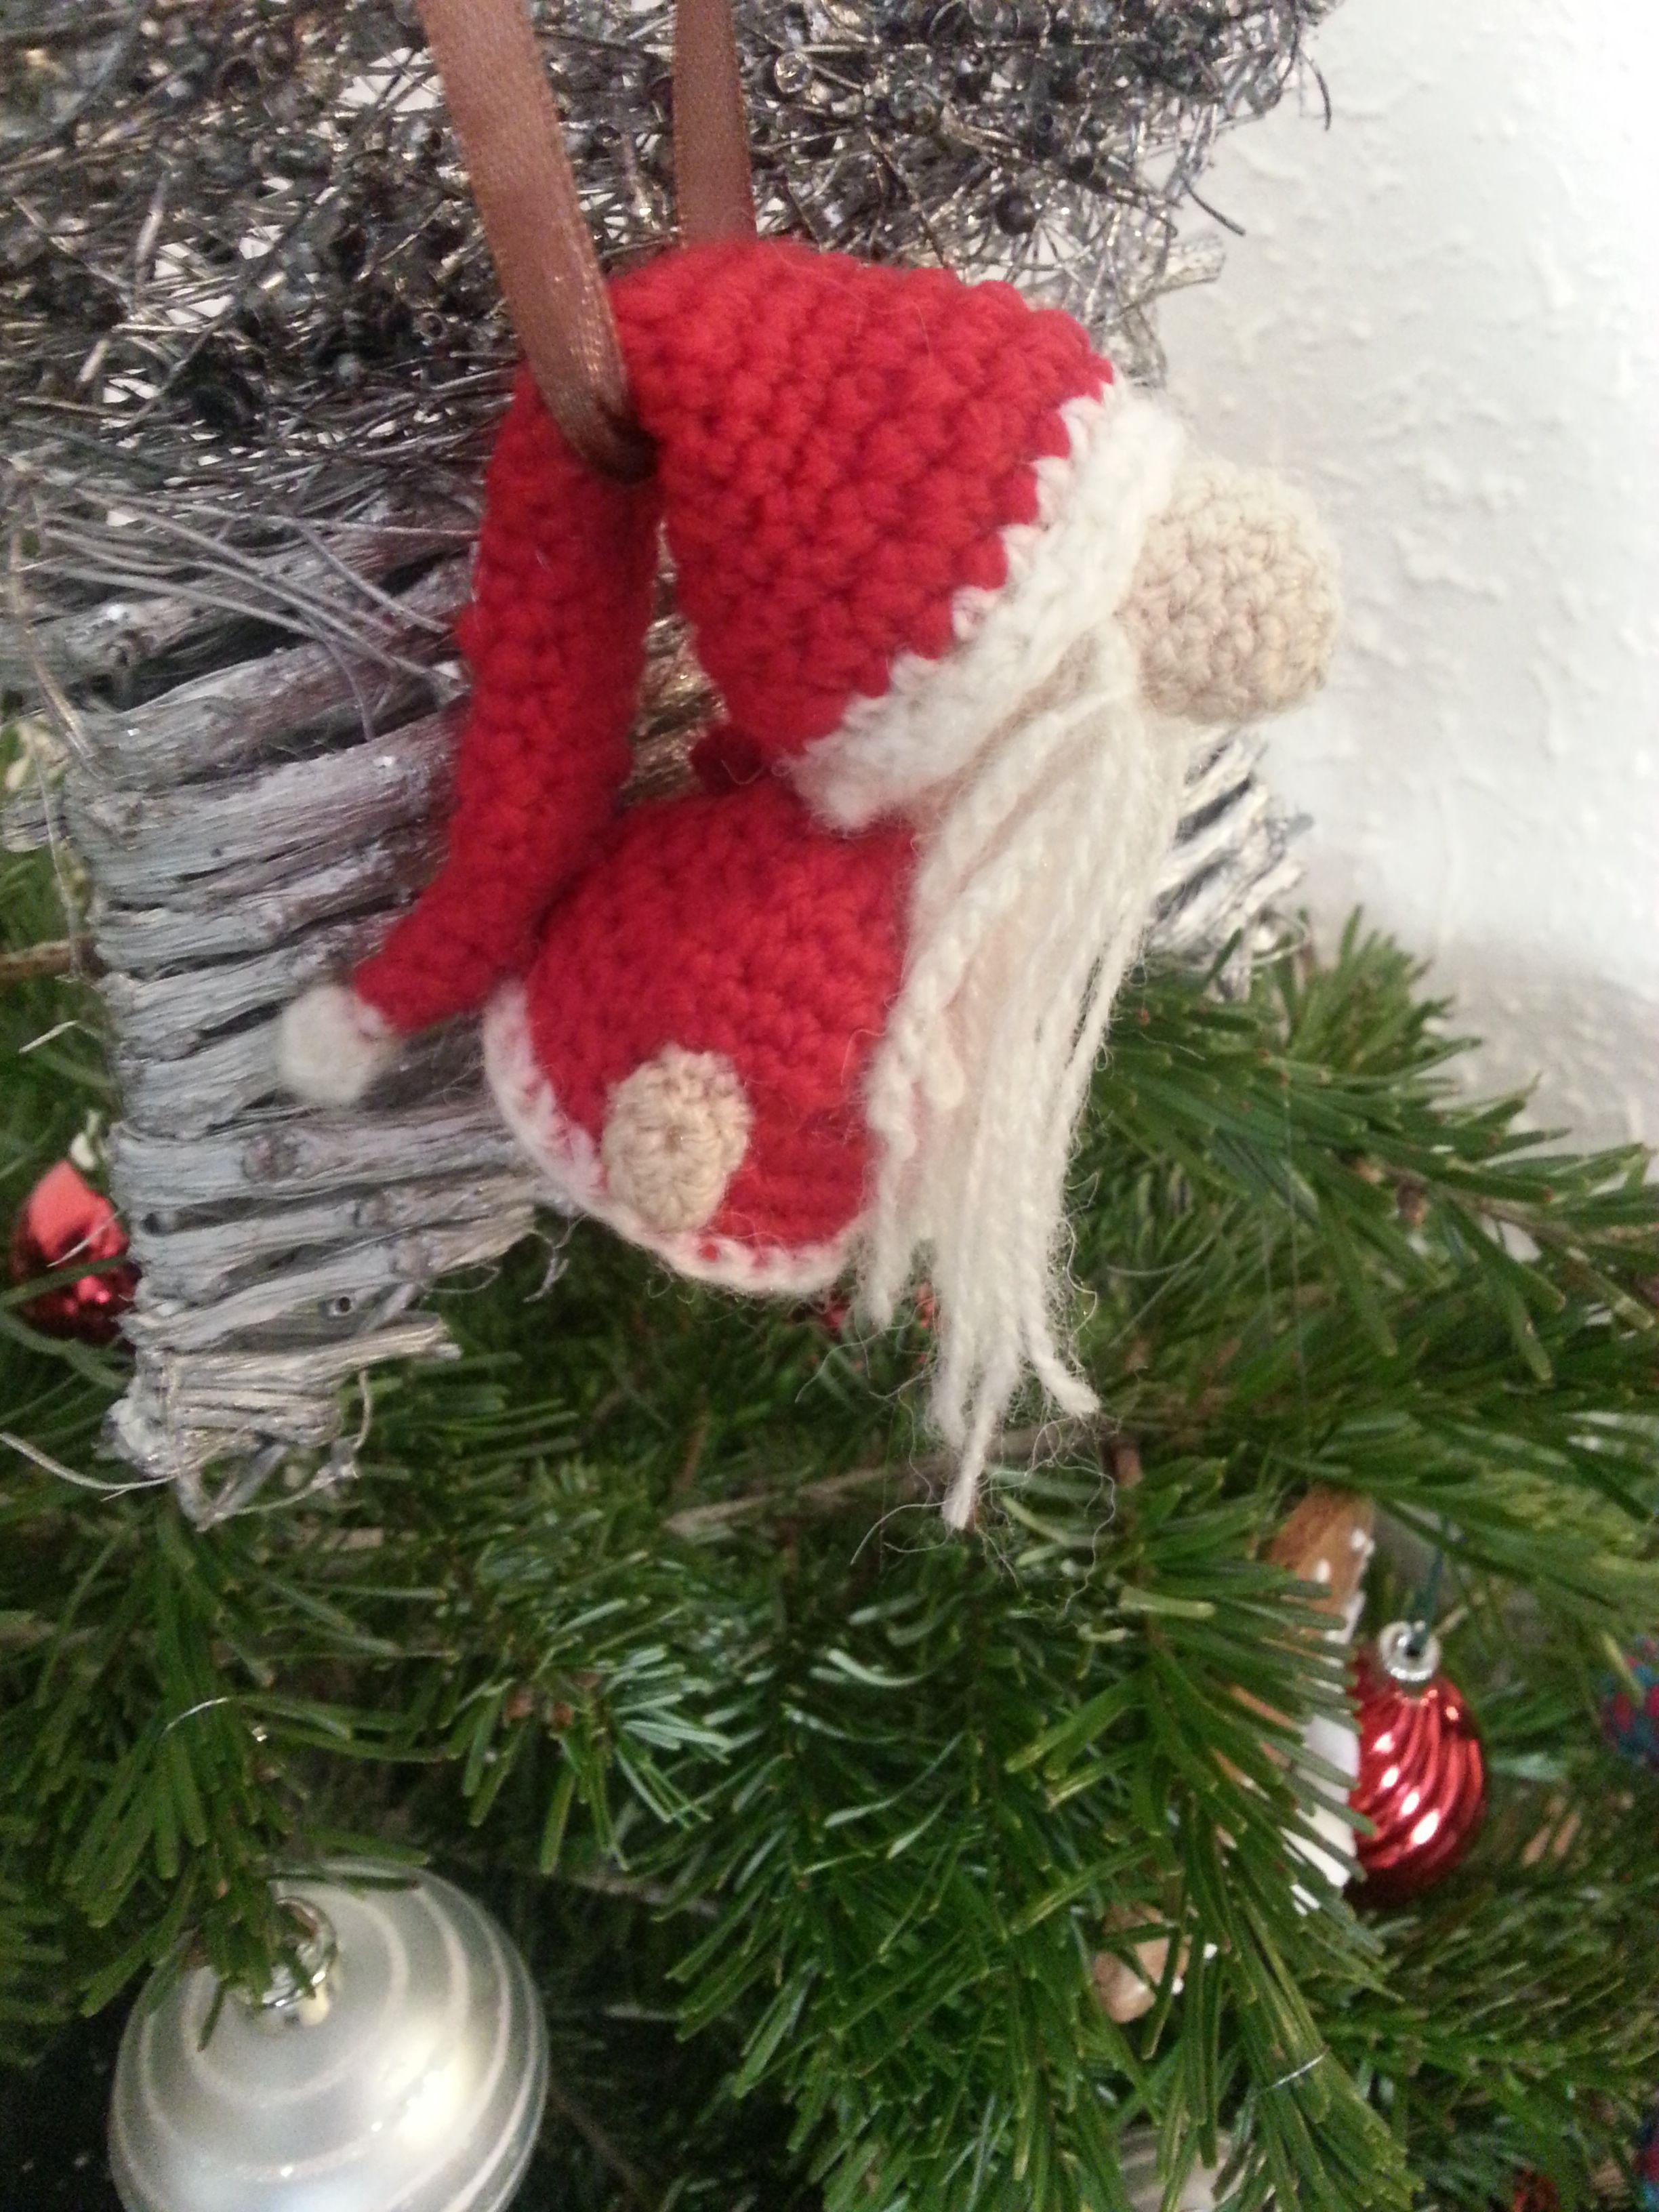 Santa Claus Amigurumi Free Pattern by Booletes.com | Free Christmas ...